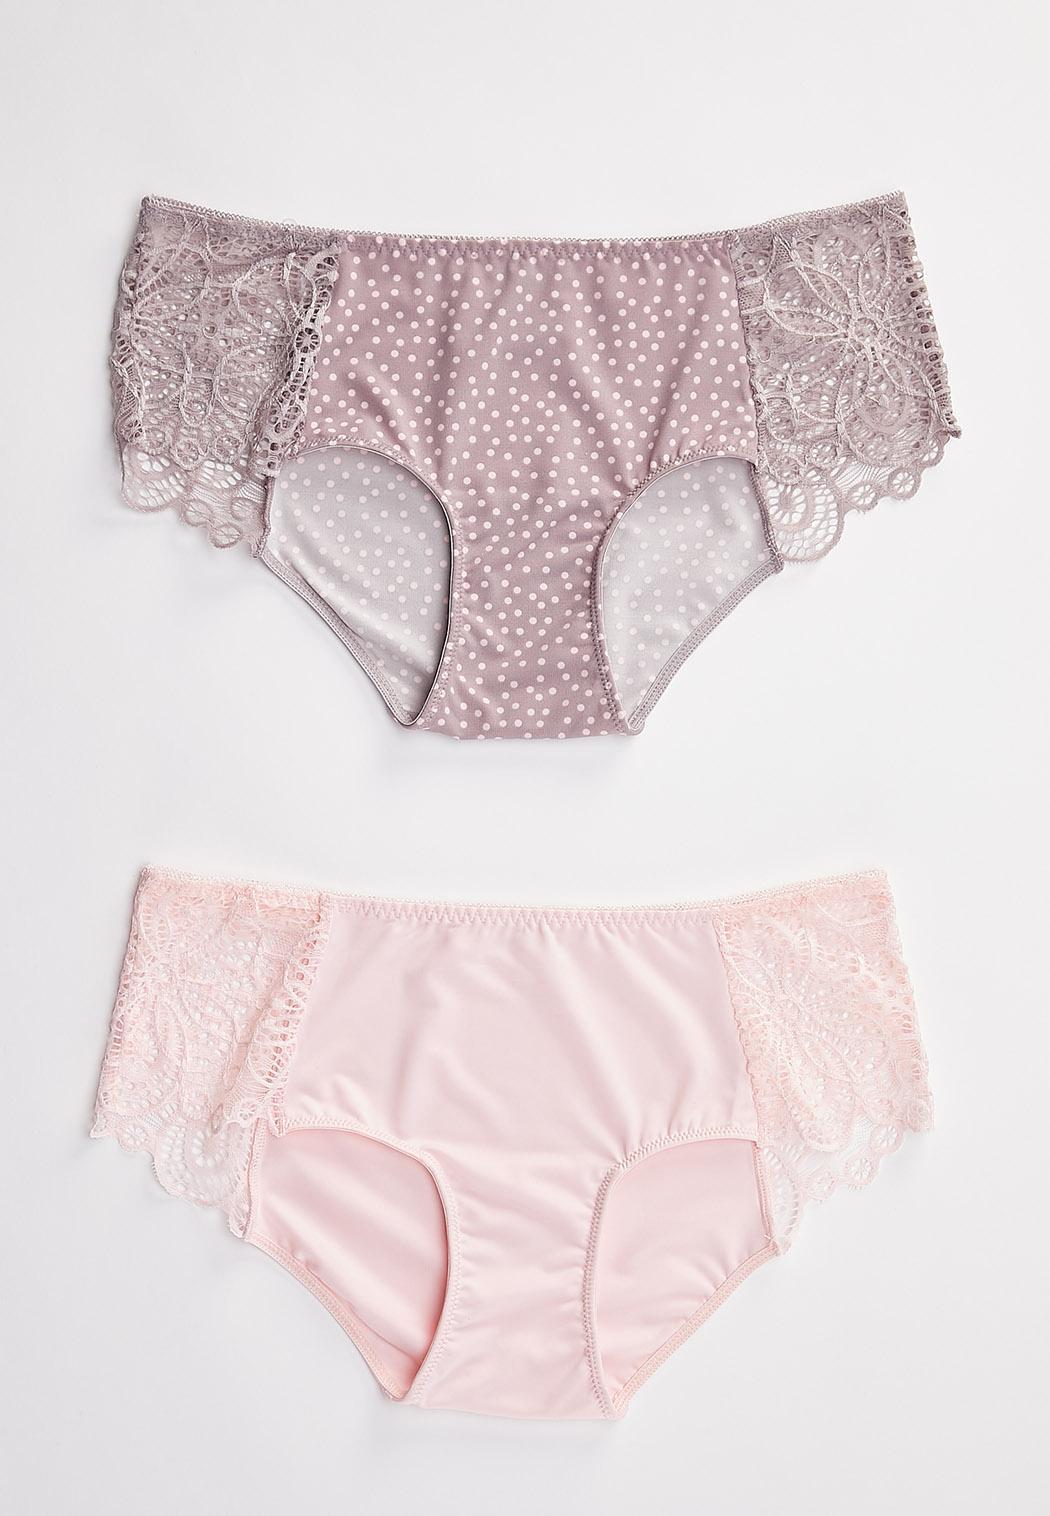 Plus Size Blossom Blast Panty Set